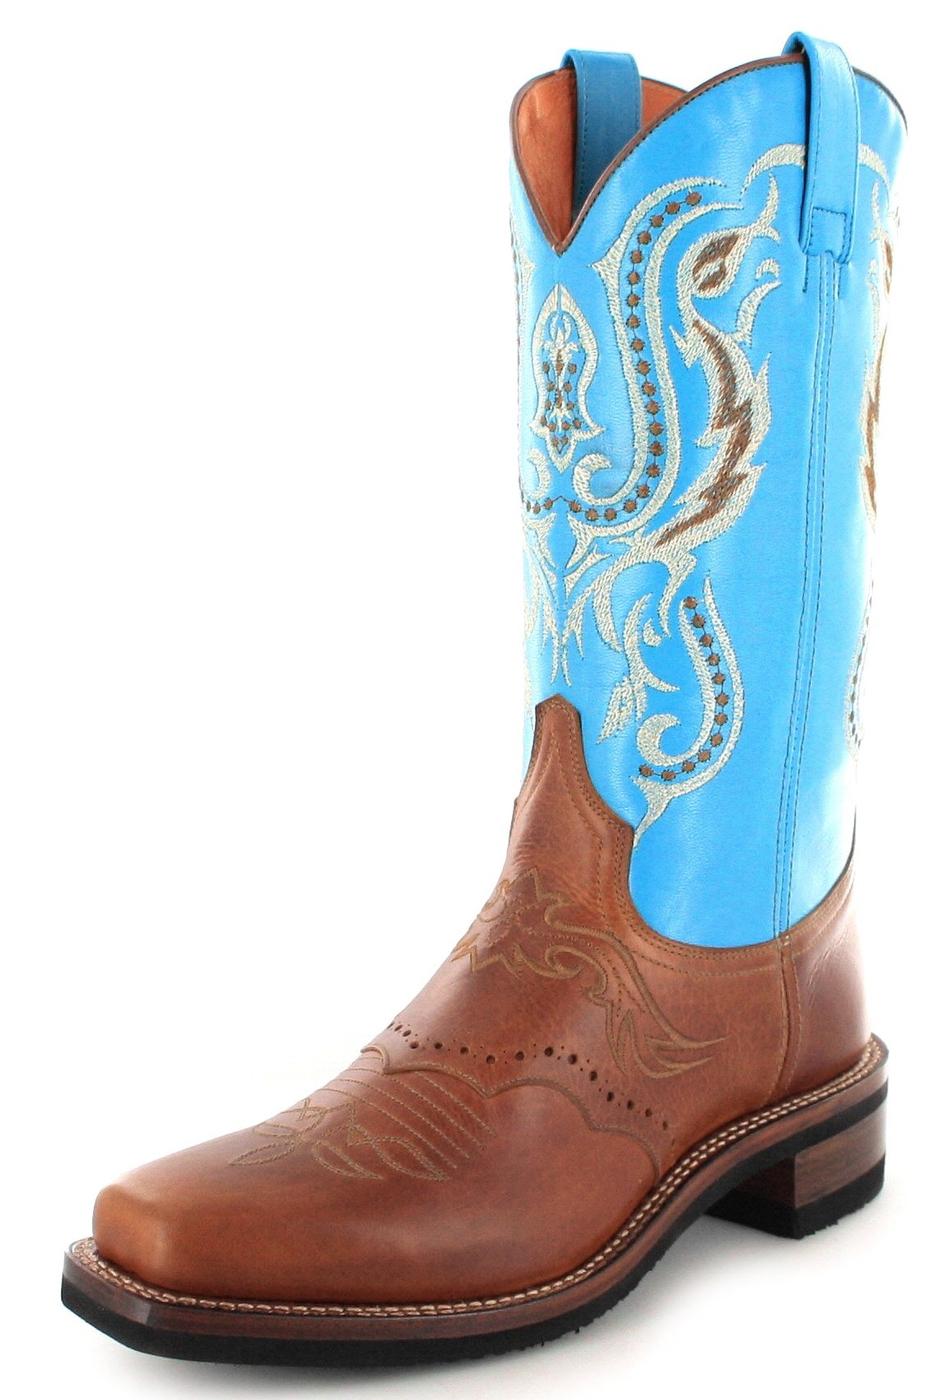 Sendra Boots 11594 Tang Westernreitstiefel - braun türkis